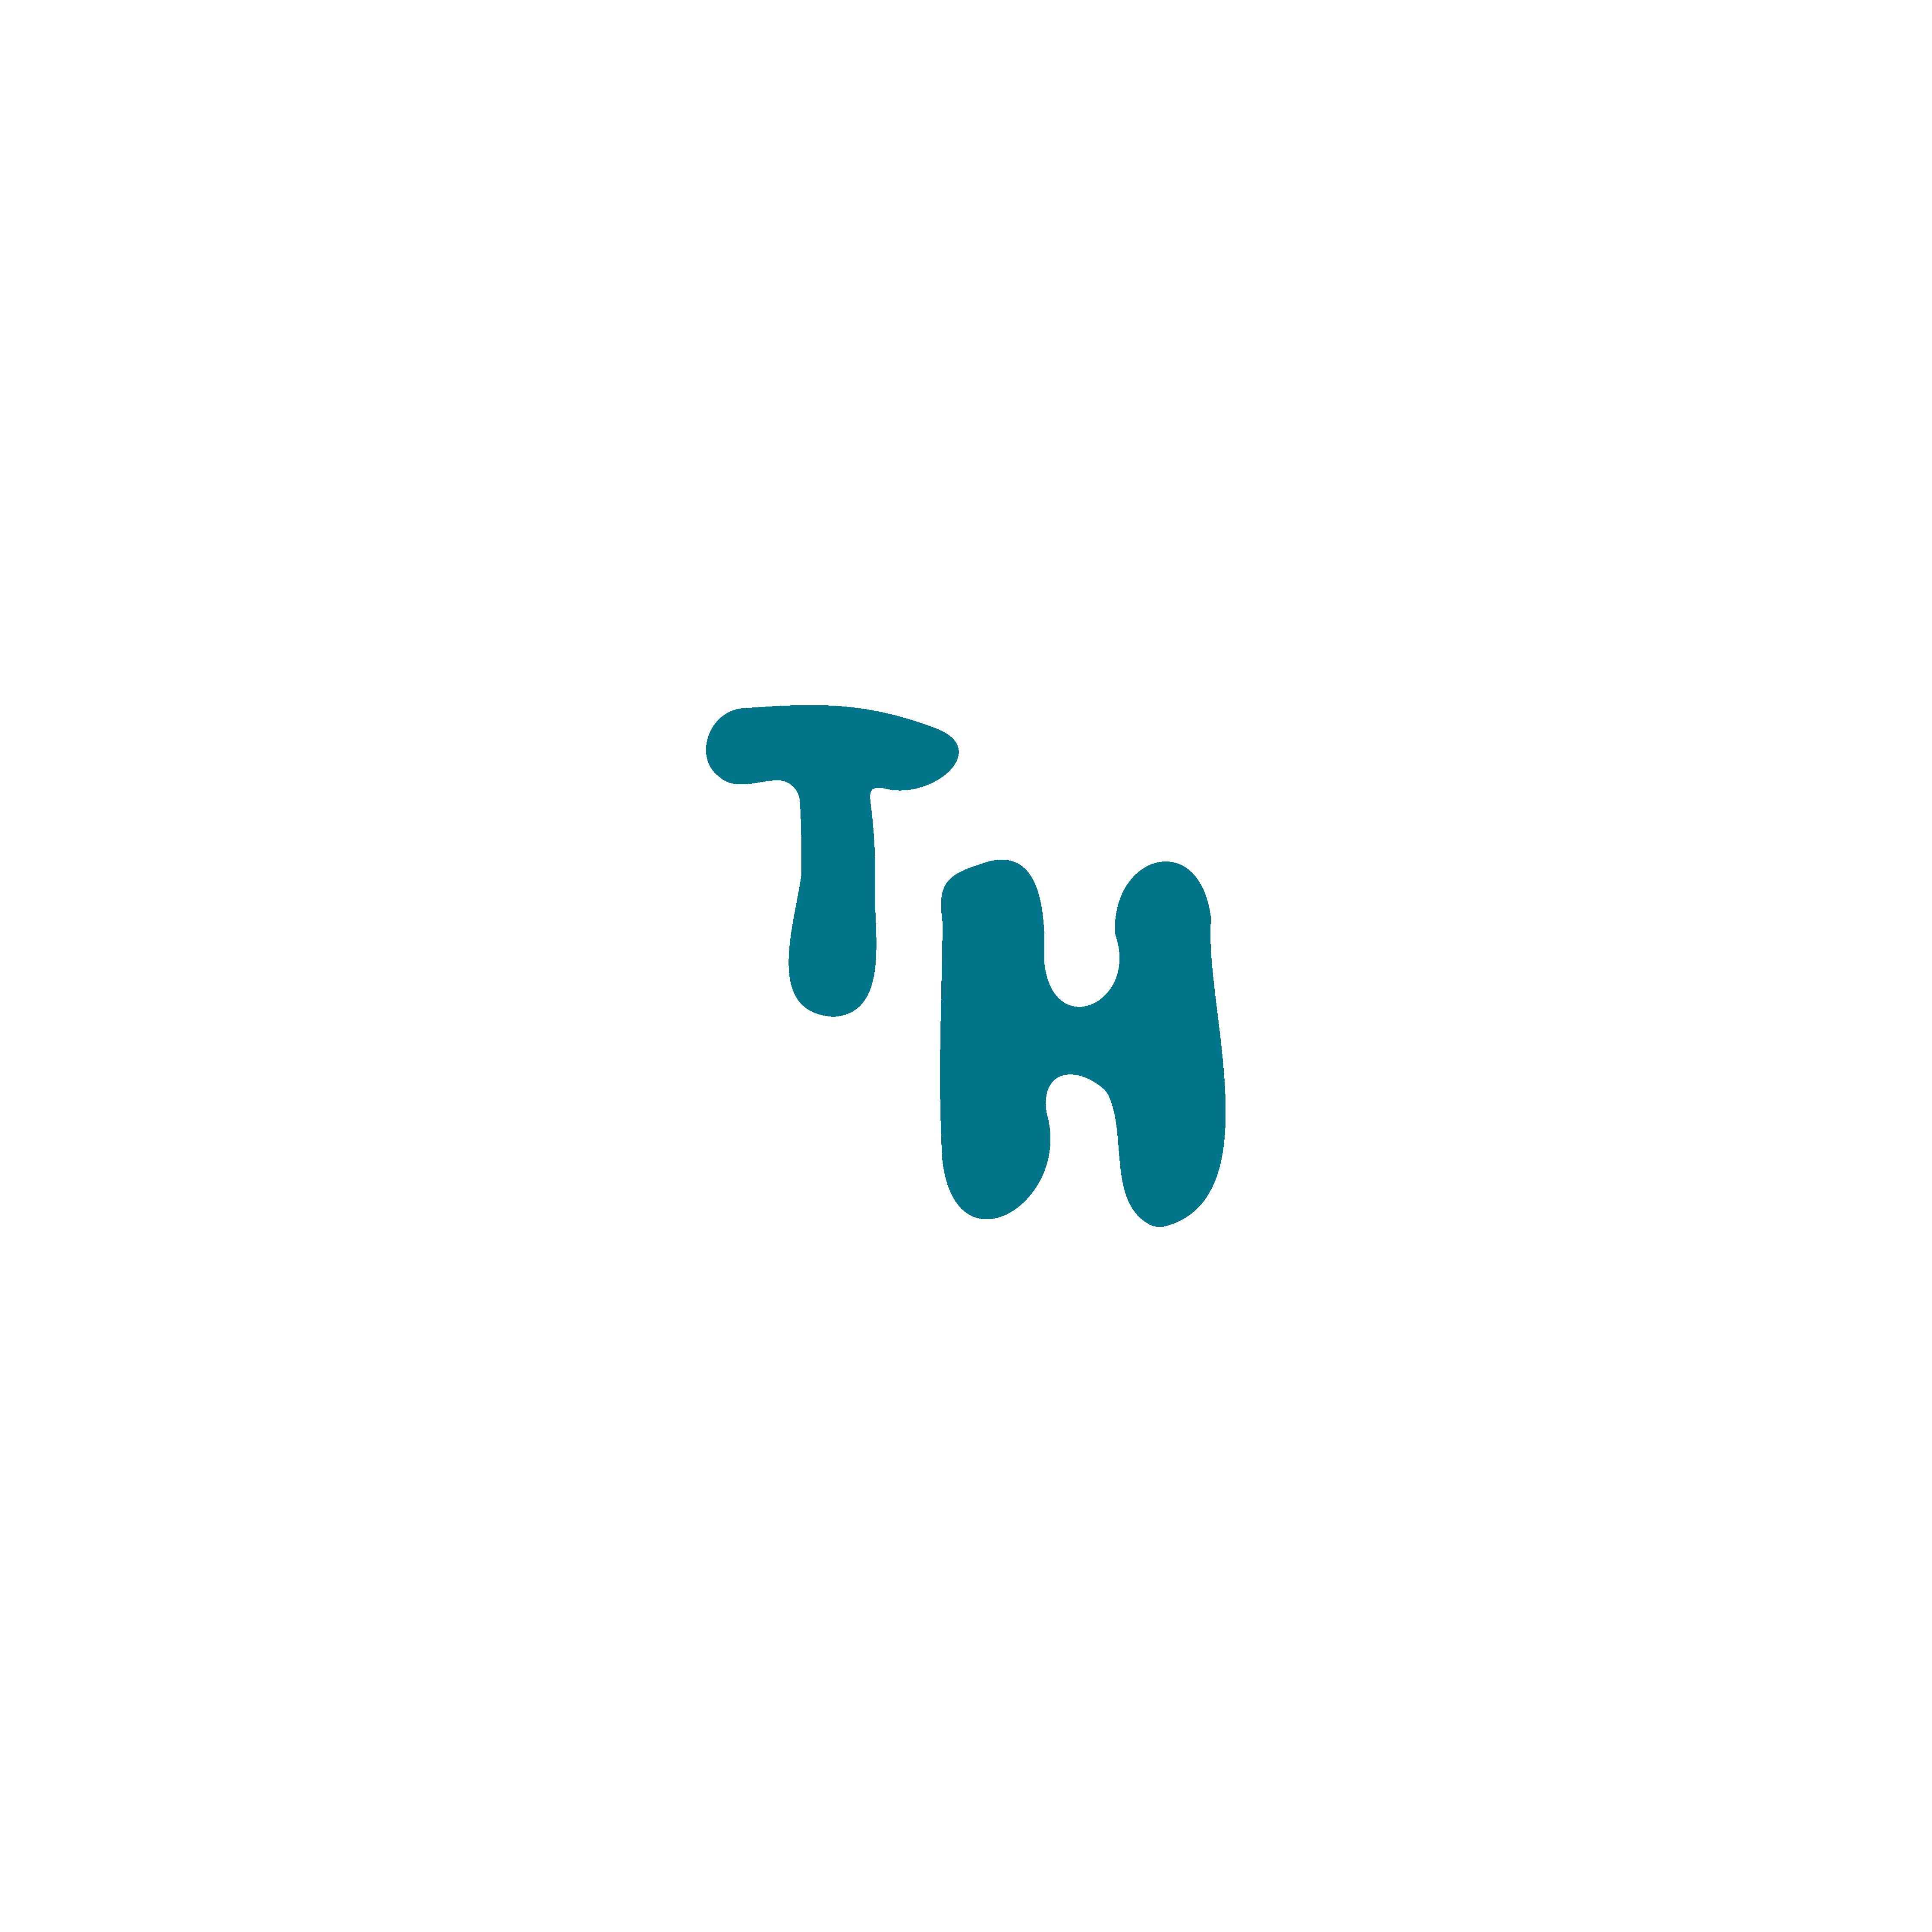 TH_Flat_Icon